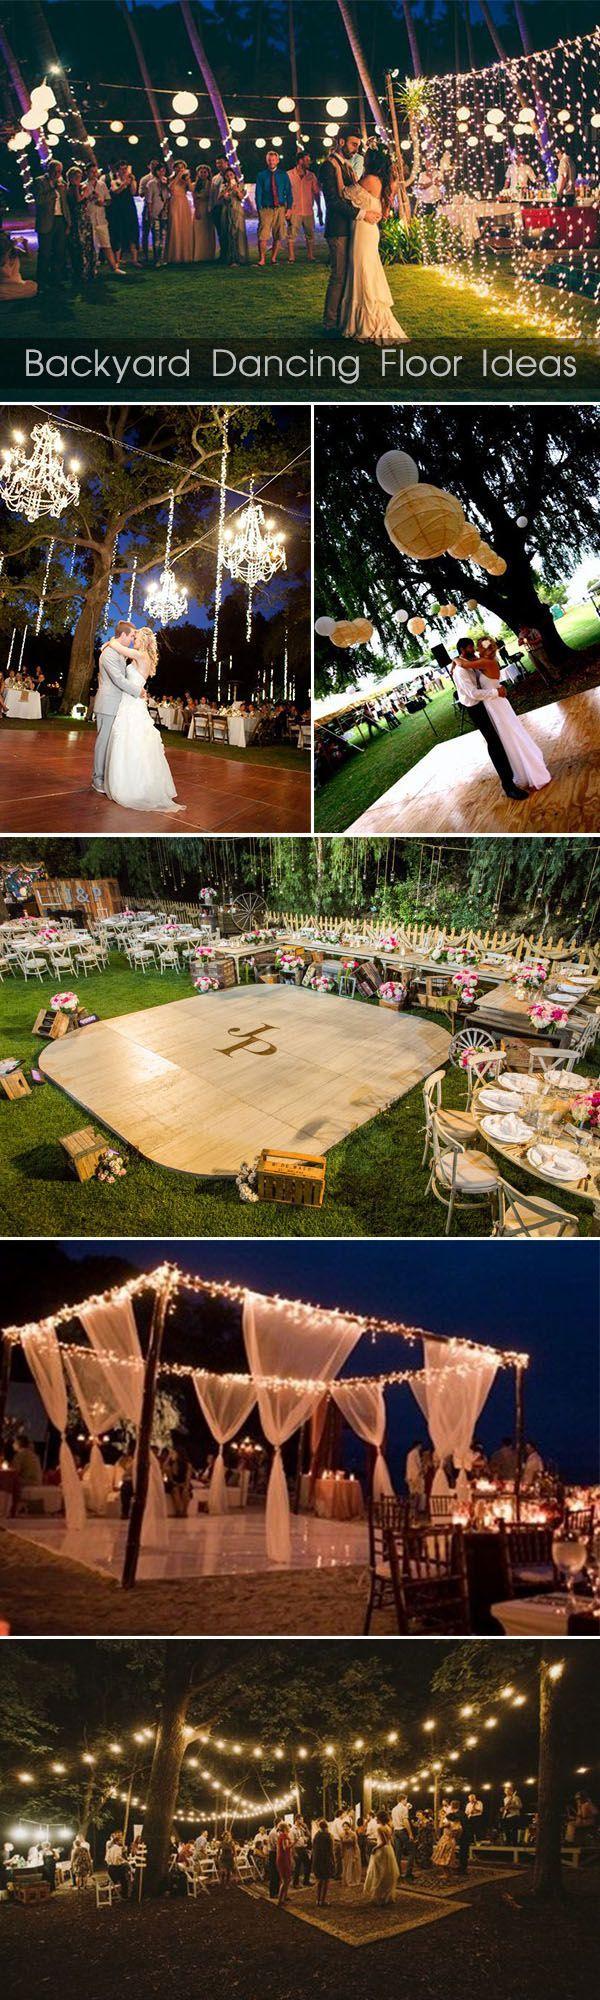 dancing floor ideas for backyard weddings